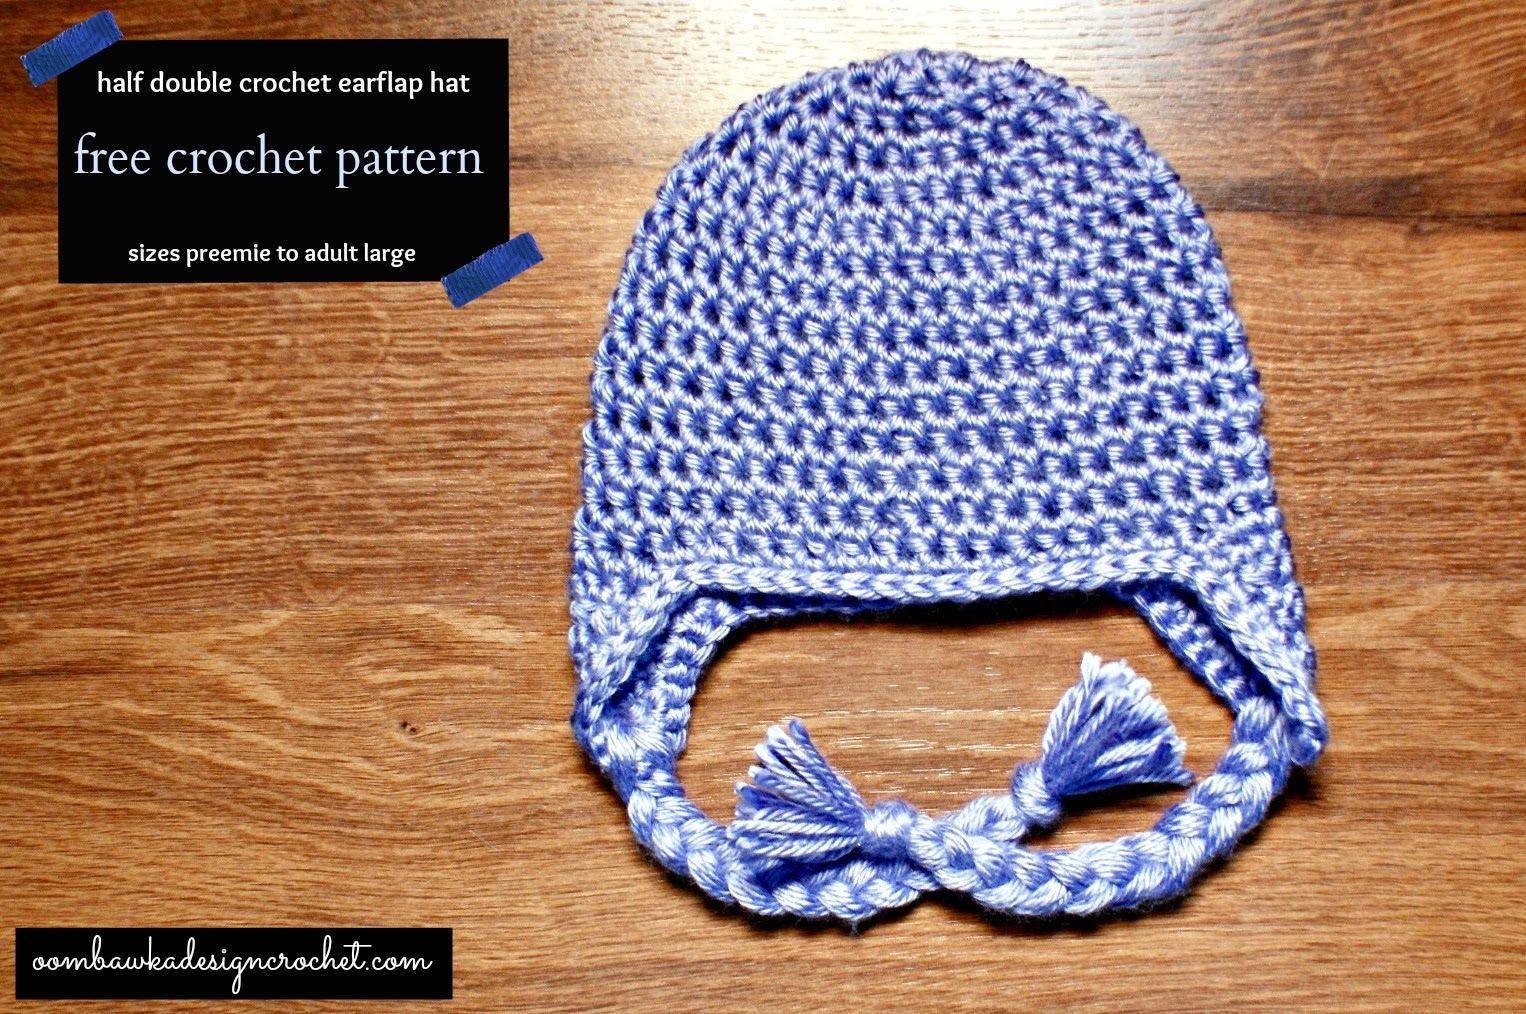 2532584f Crochet Earflap Hat Pattern Oombawka Design HOT on Ravelry! This lovely  crochet hat pattern by